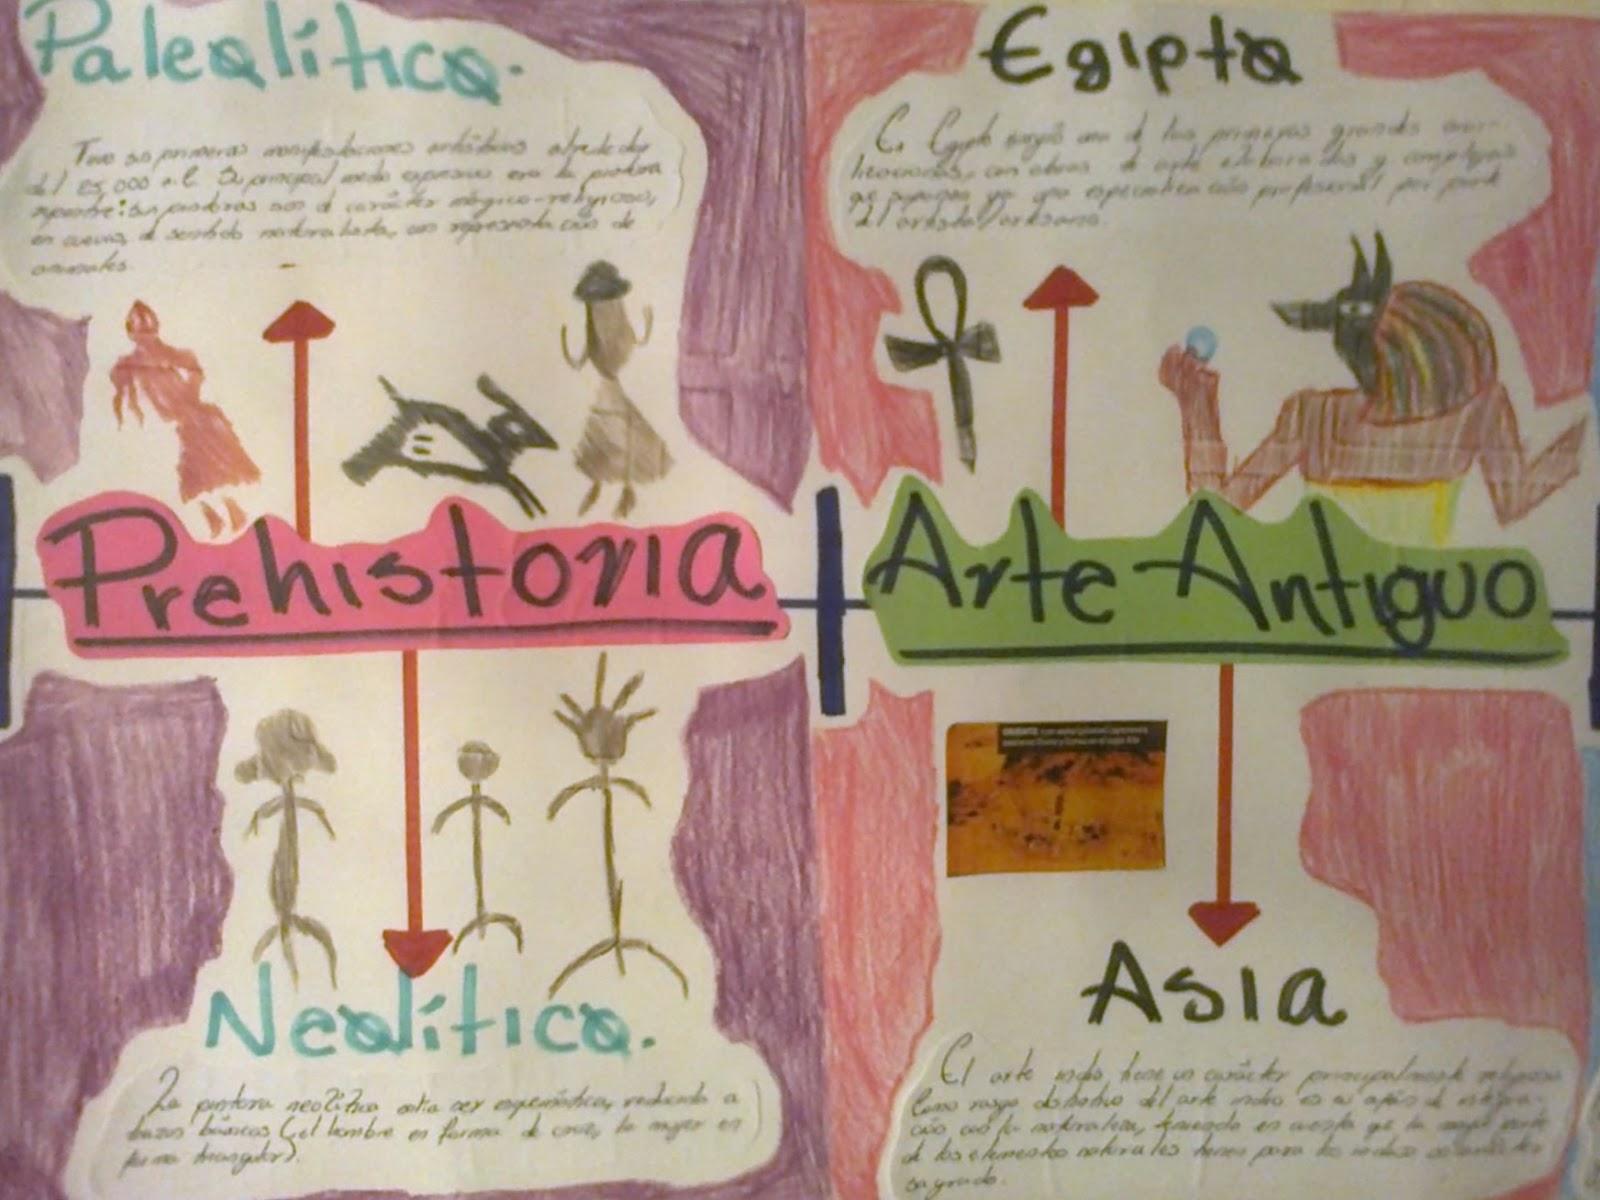 Diseo Grfico Lnea del tiempo de la Historia del ArteDiseo